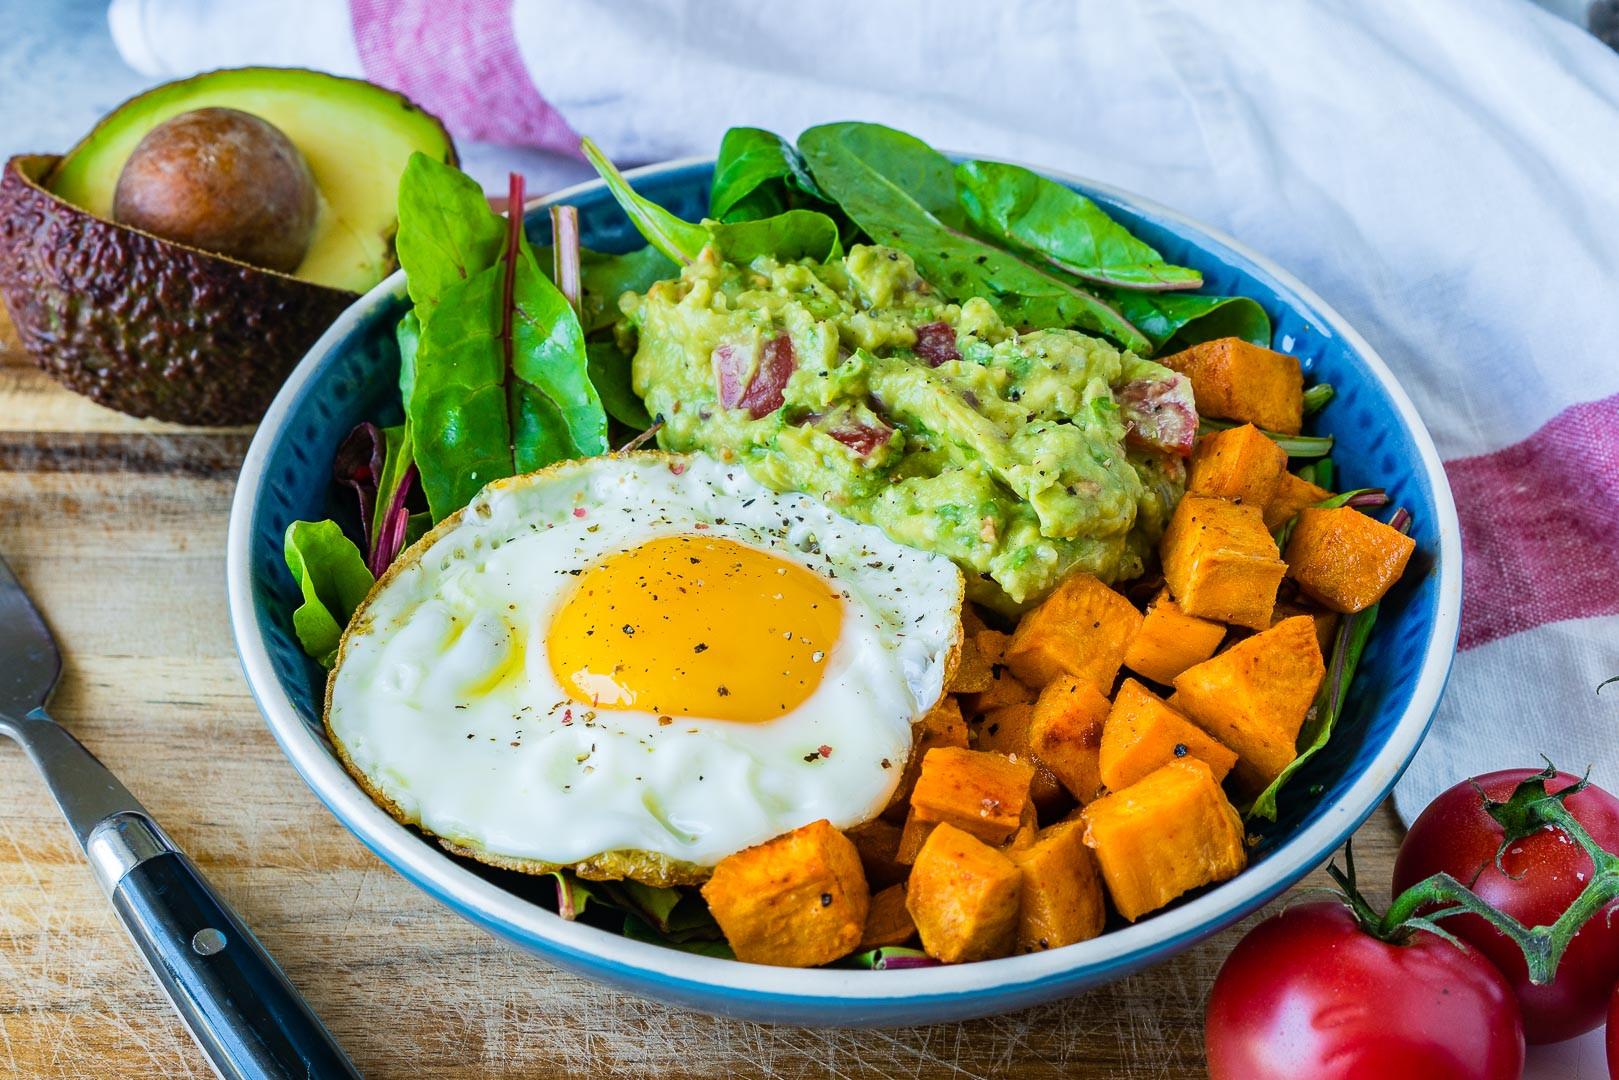 Healthy Guacamole Meals  Clean Eating Guacamole Egg Sweet Potato Breakfast Bowls